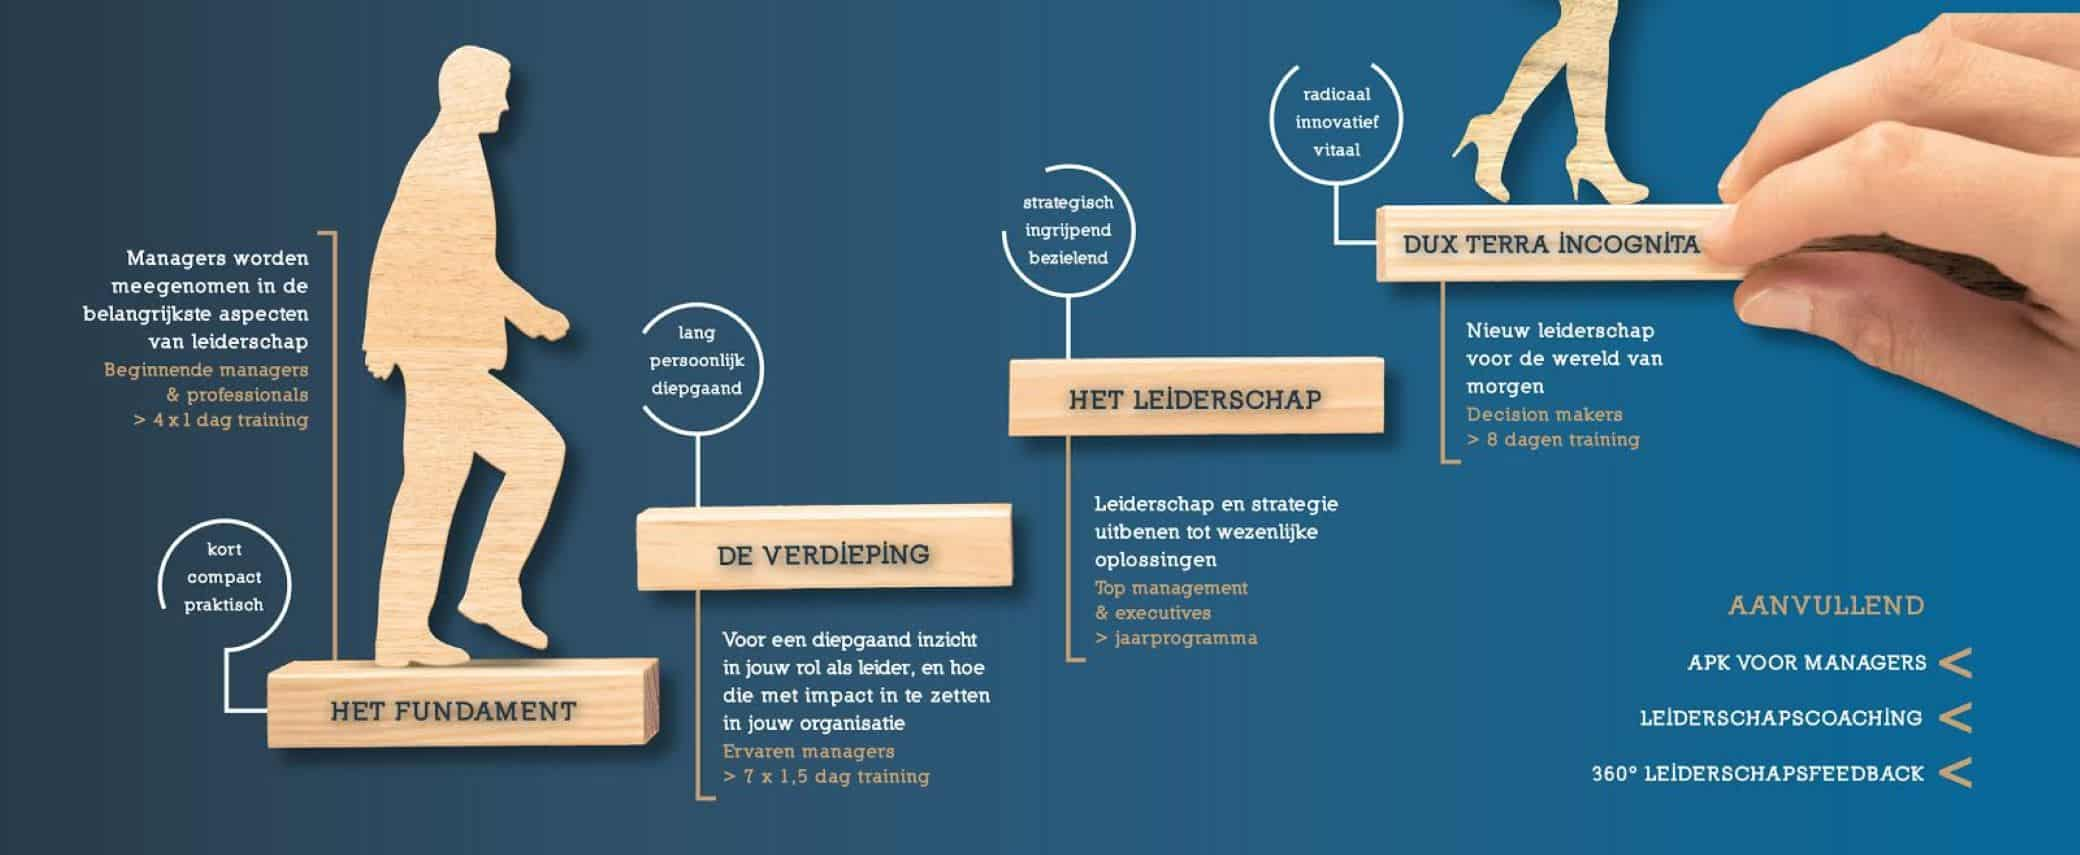 Leiderschapsprogramma's infographic